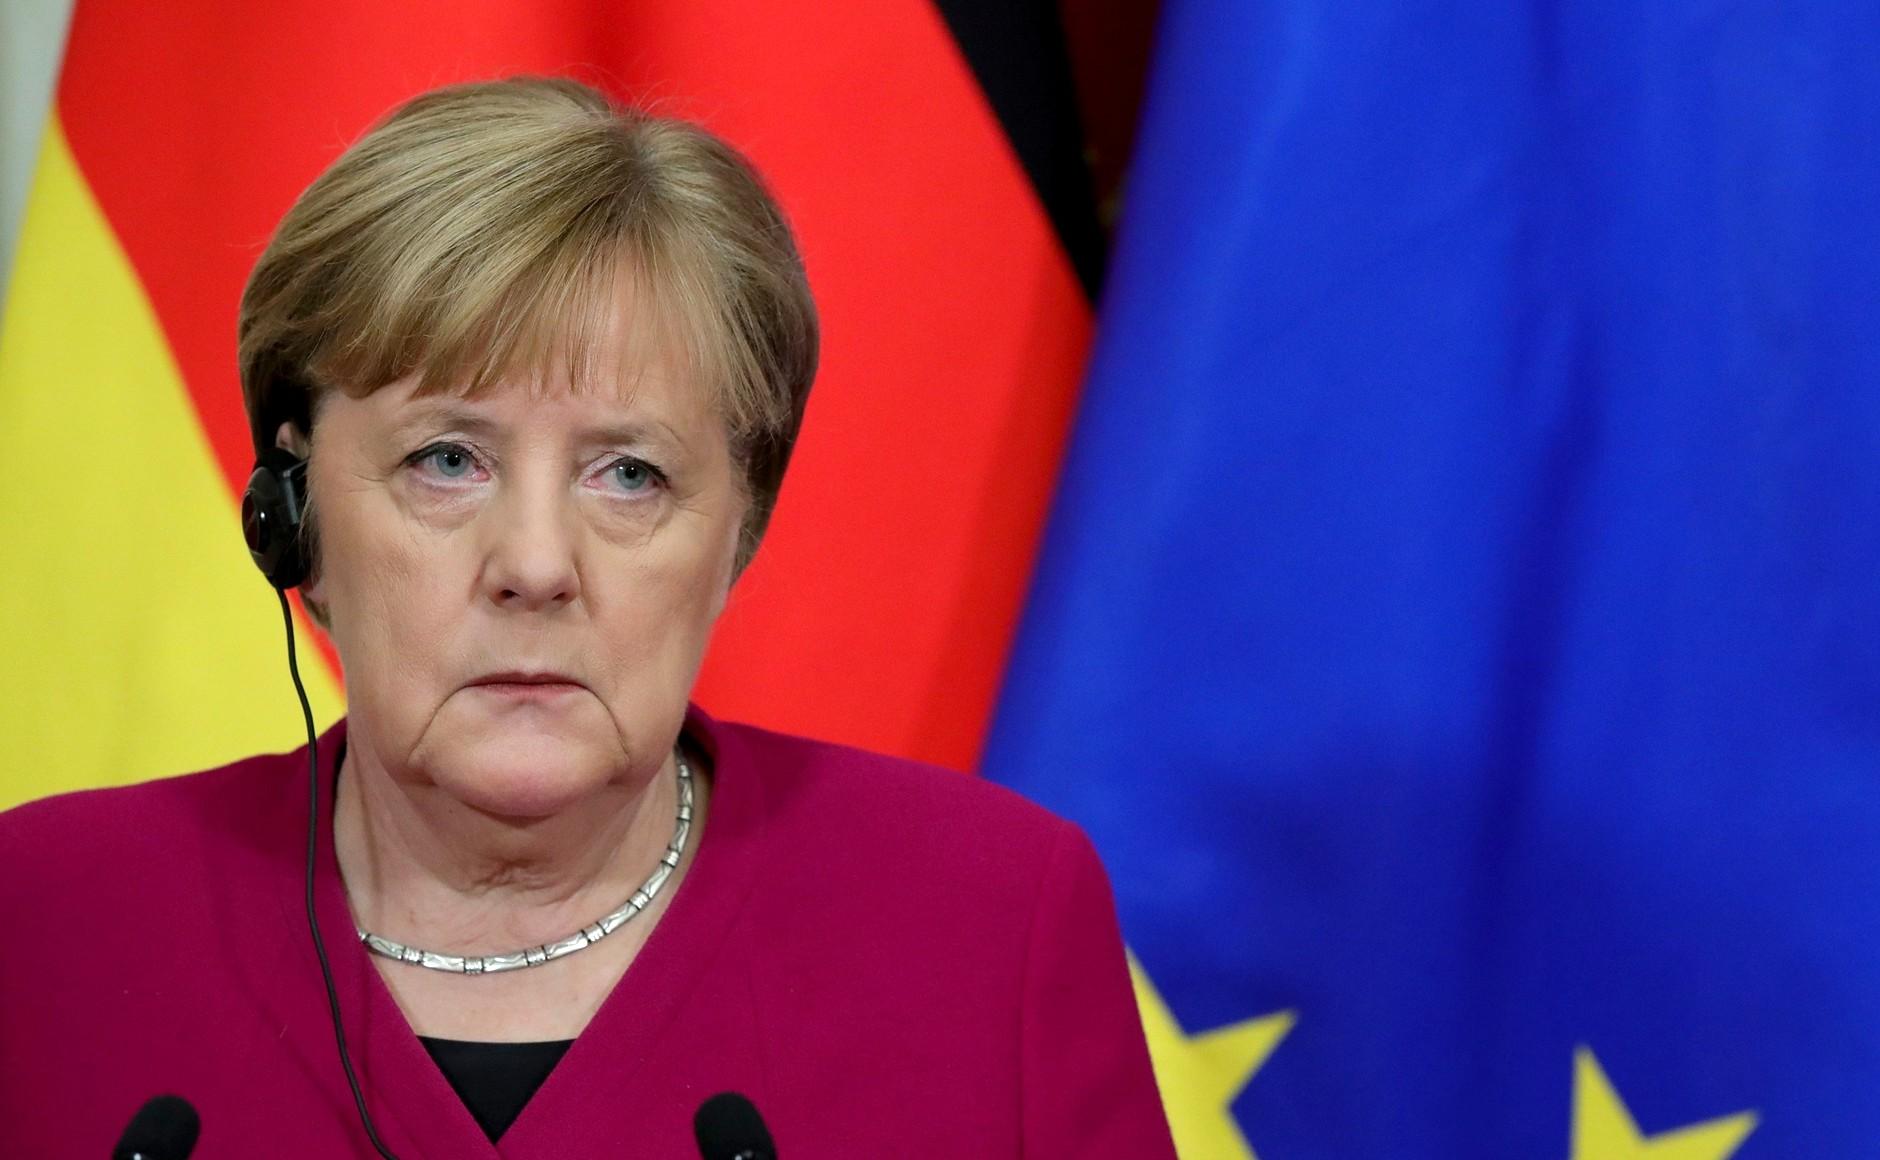 Merkel visited Russian opposiiton leader Alexei Navalny in hospital